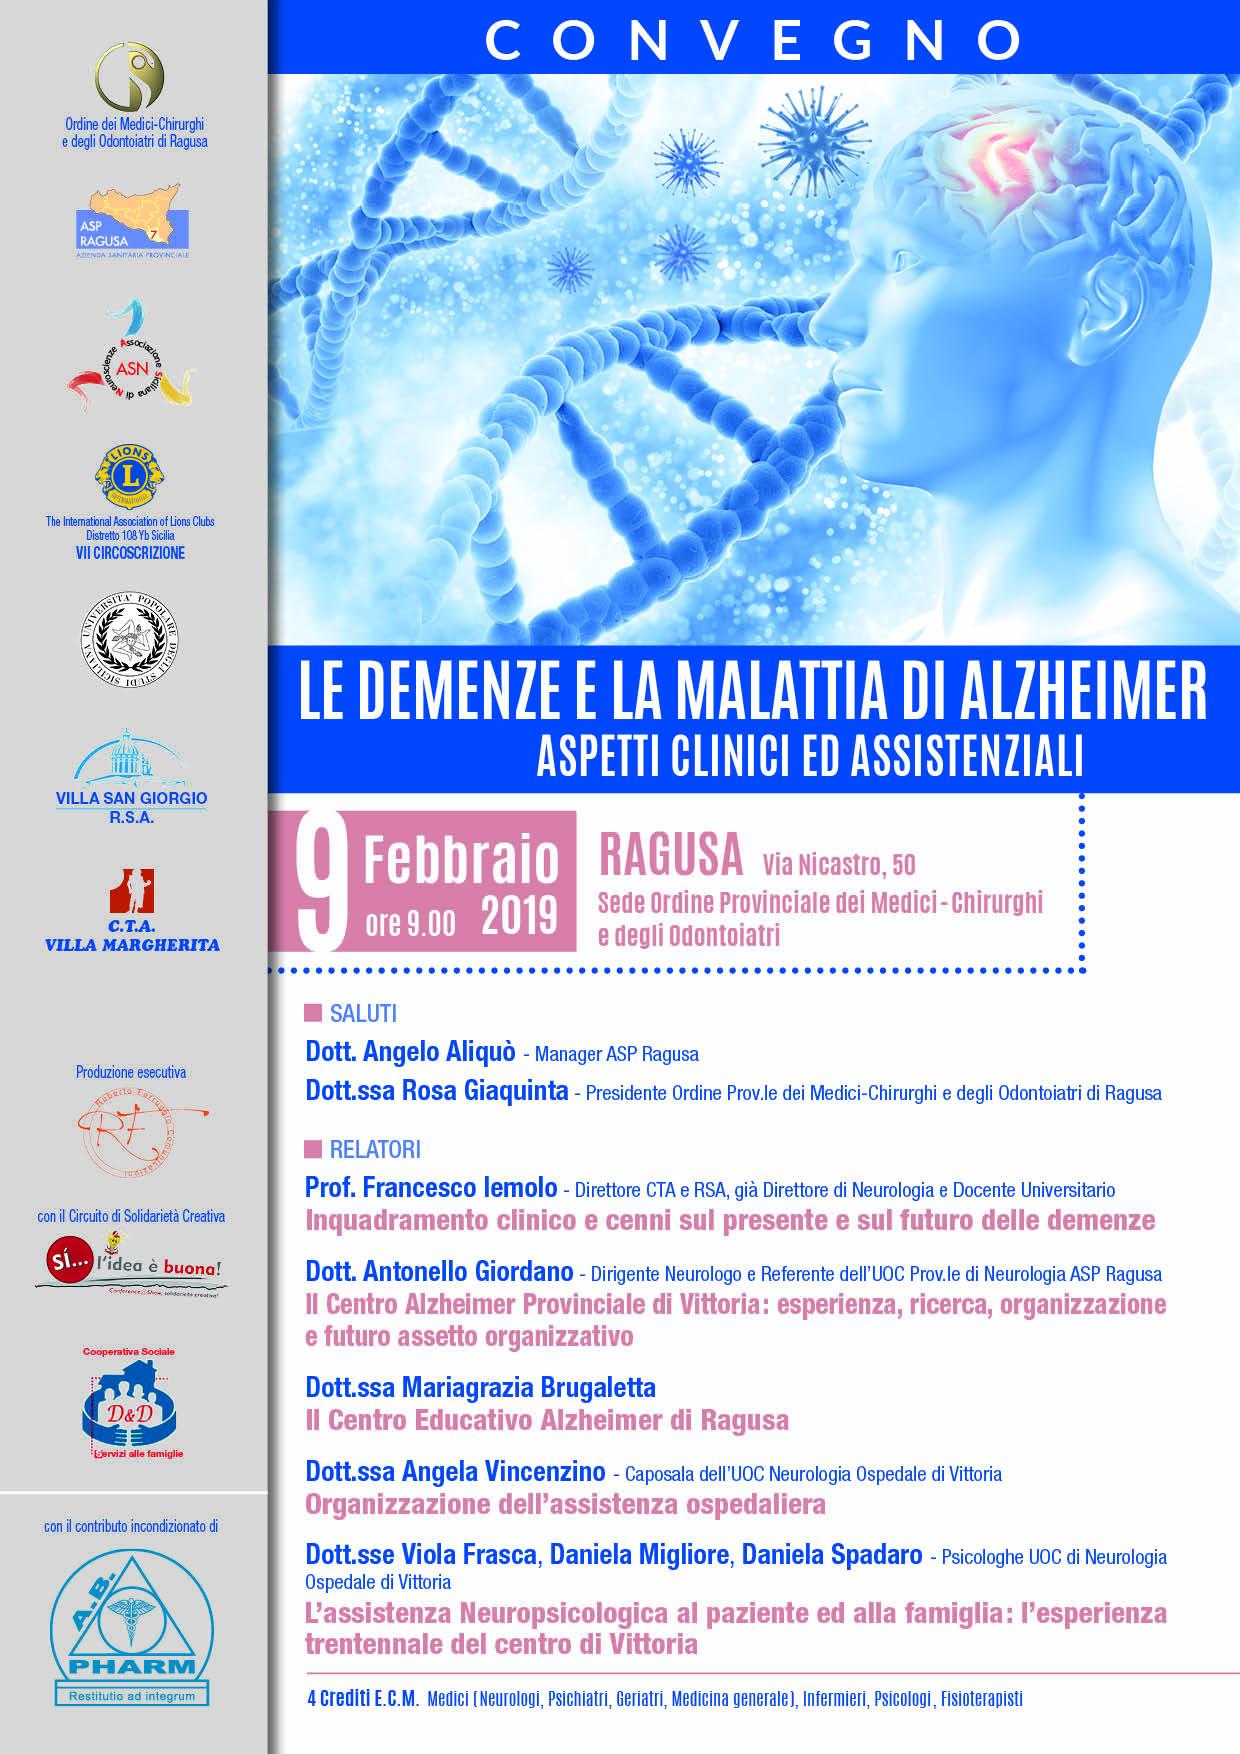 Convegno Alzheimer 9 febbraio 2019